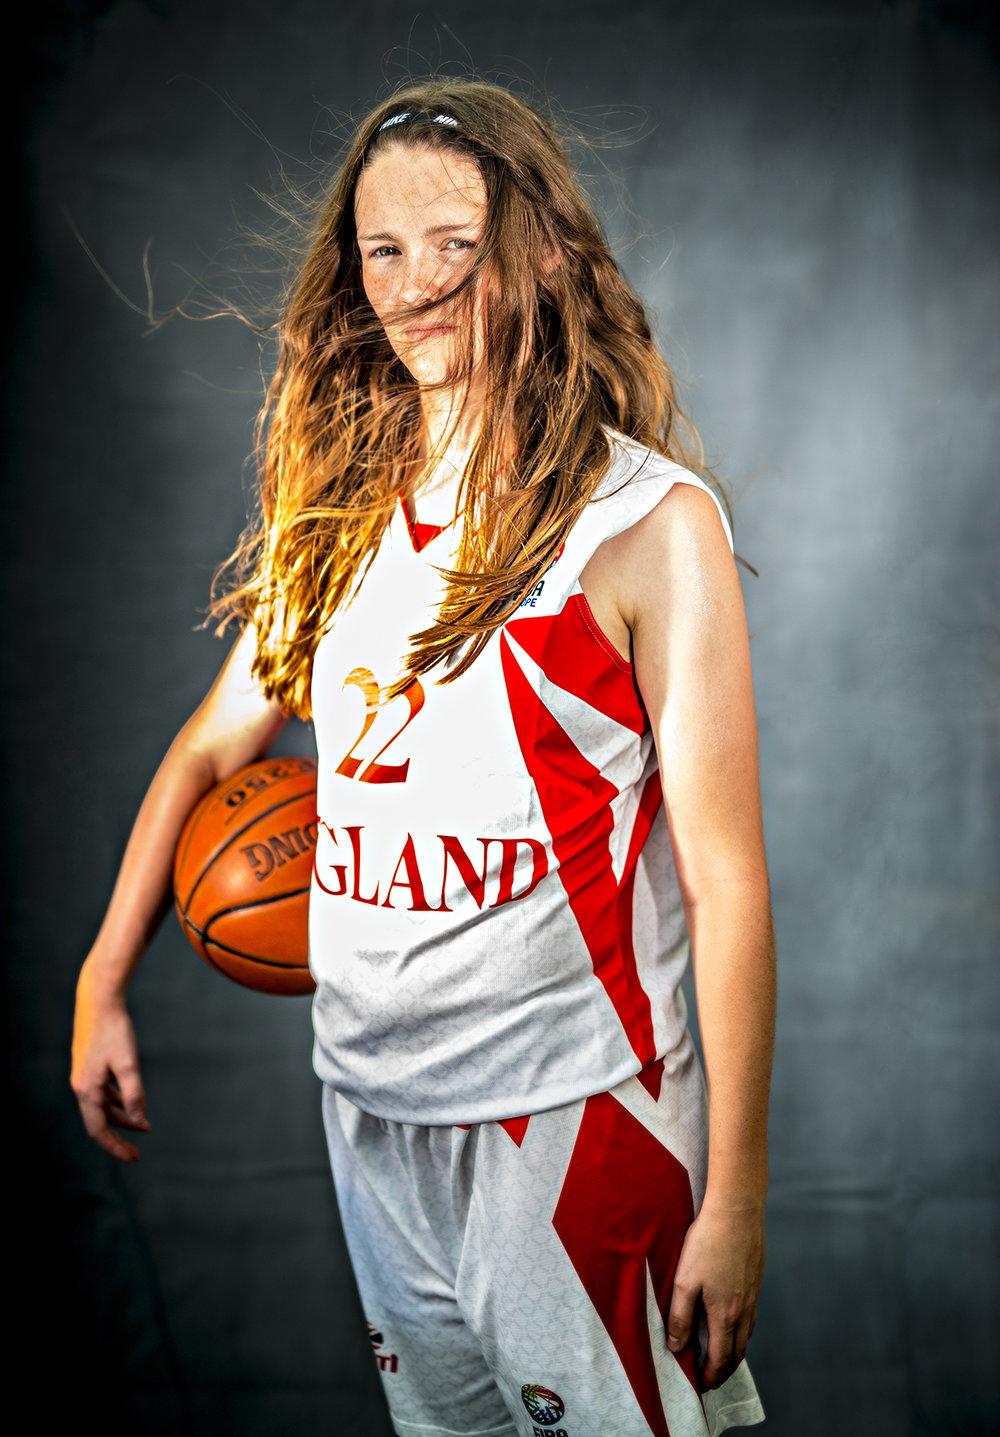 England U19's Basketball player from Woodbridge, Suffolk.